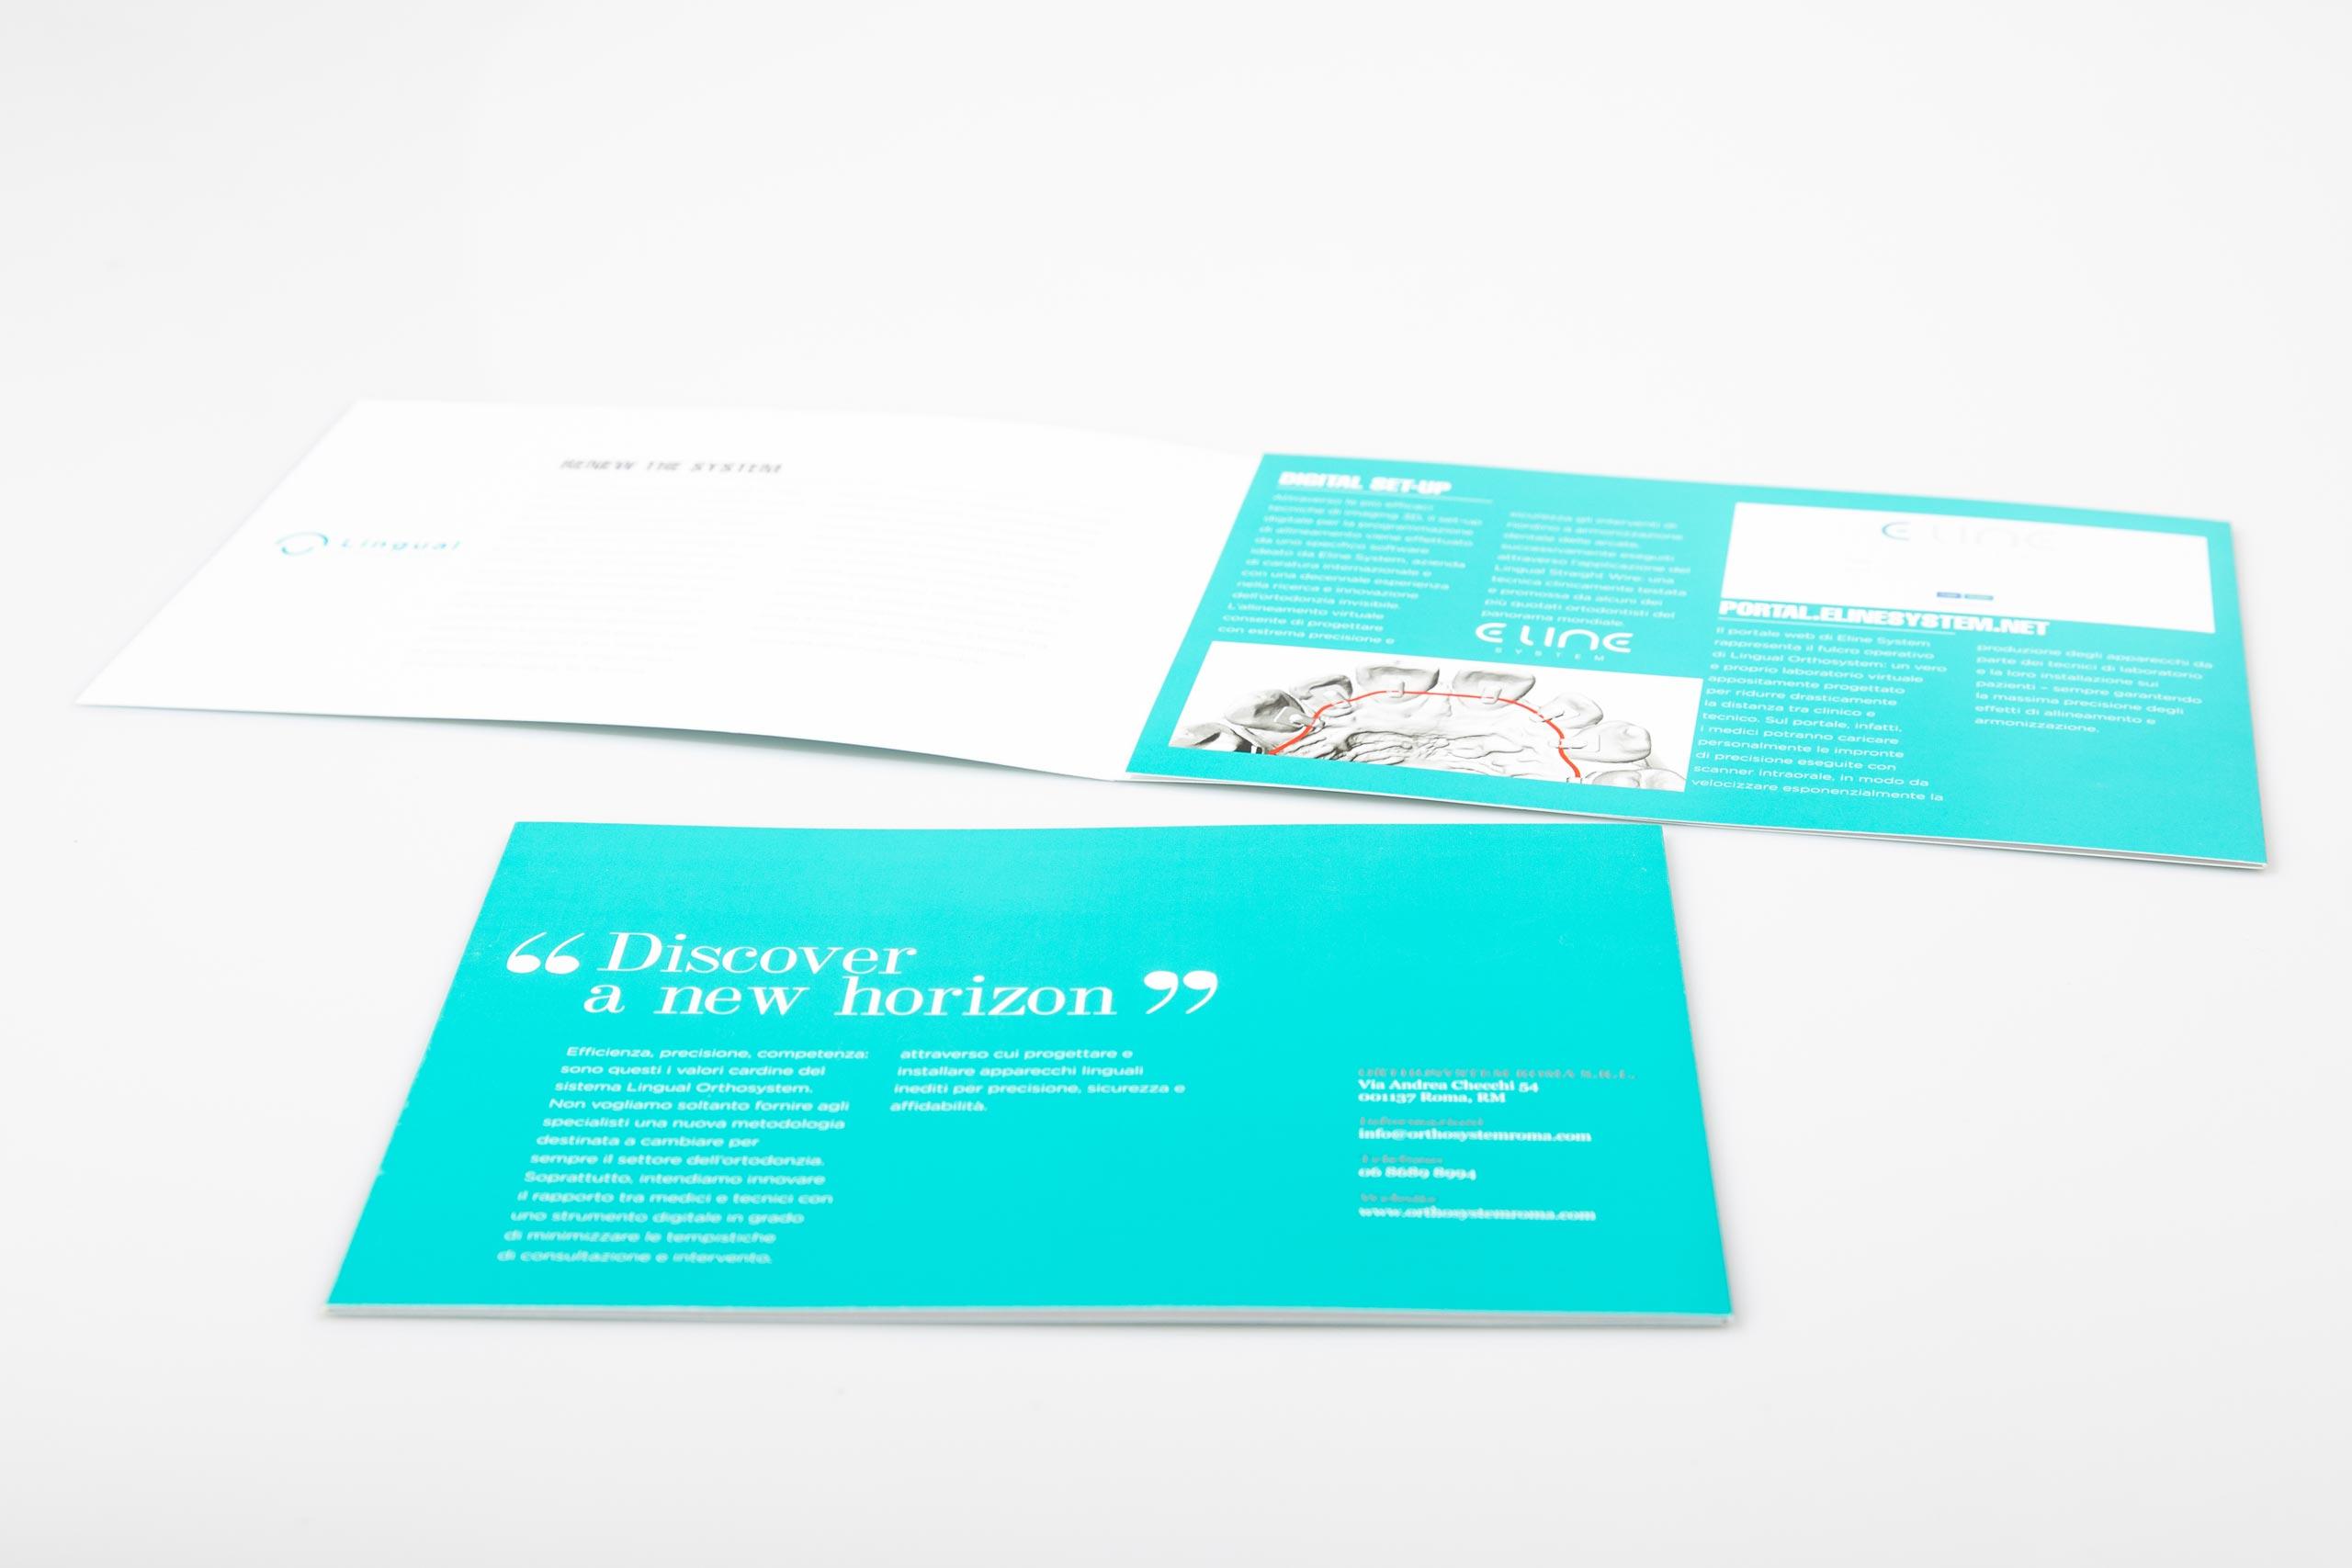 bouncy-particle-comunicazione-marketing-eline